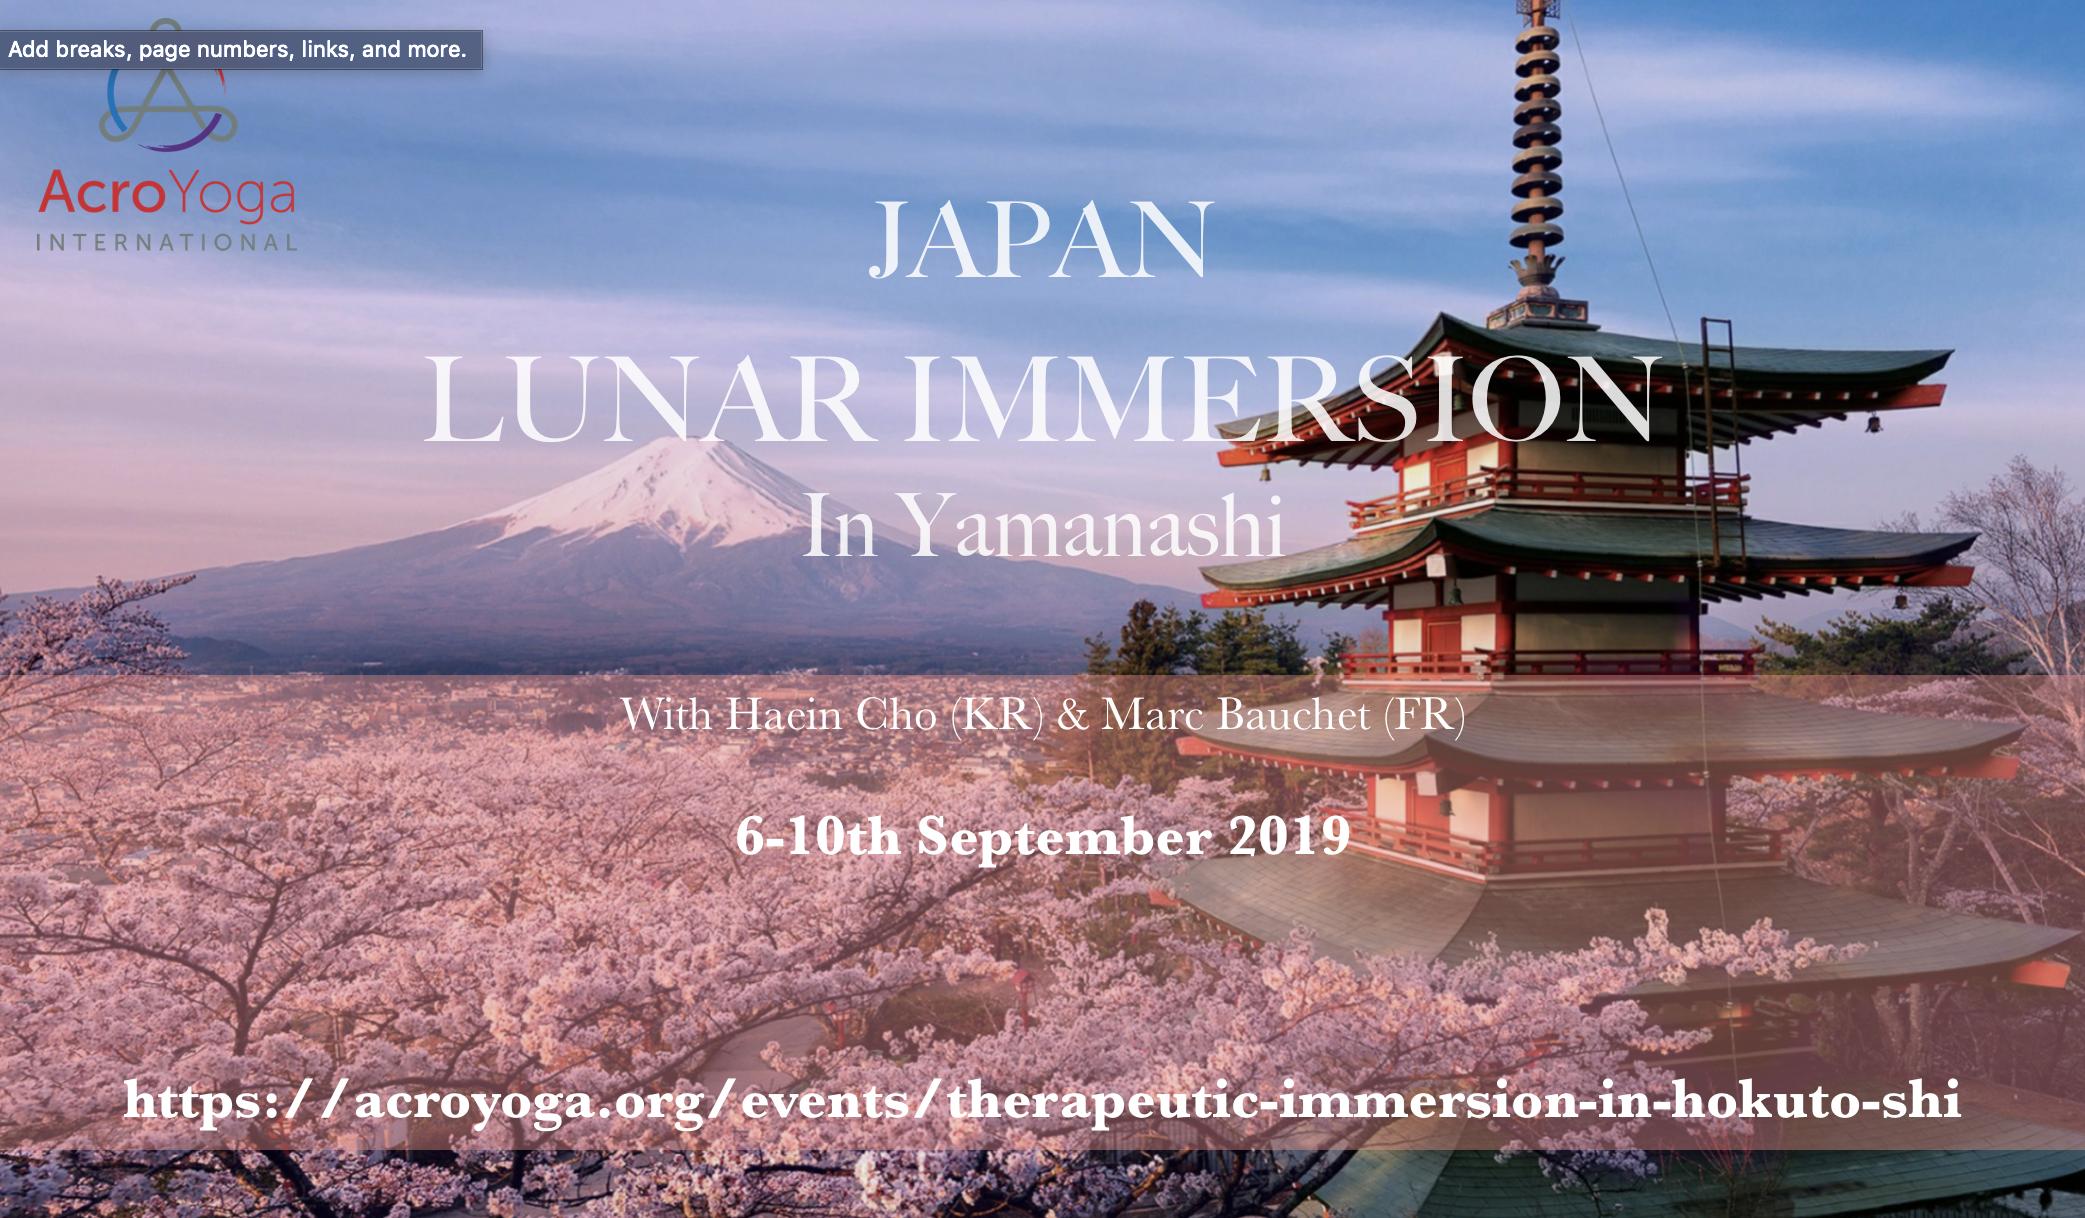 Japan Acroyoga Lunar Immersion 6-10th Sep